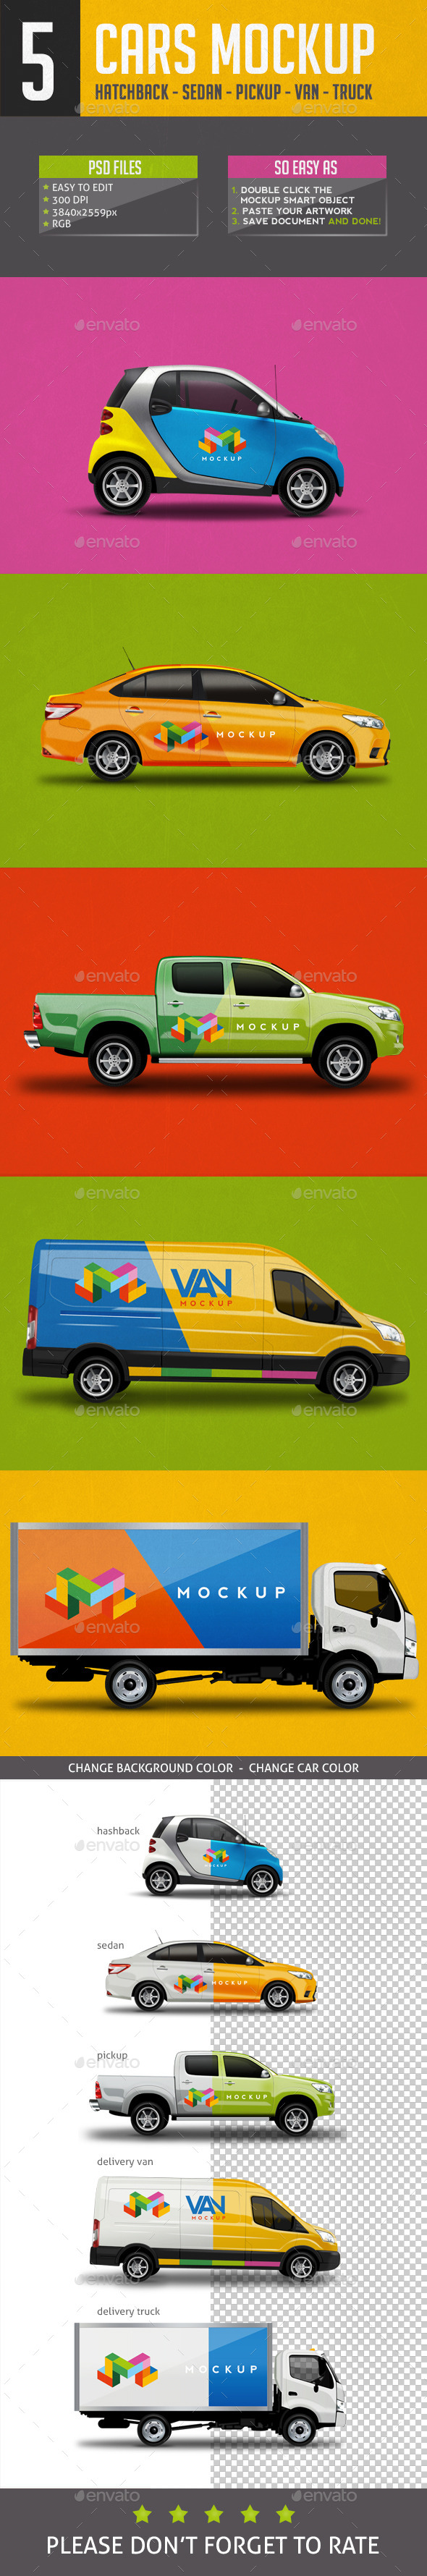 Cars Mock Up V1 - Vehicle Wraps Print